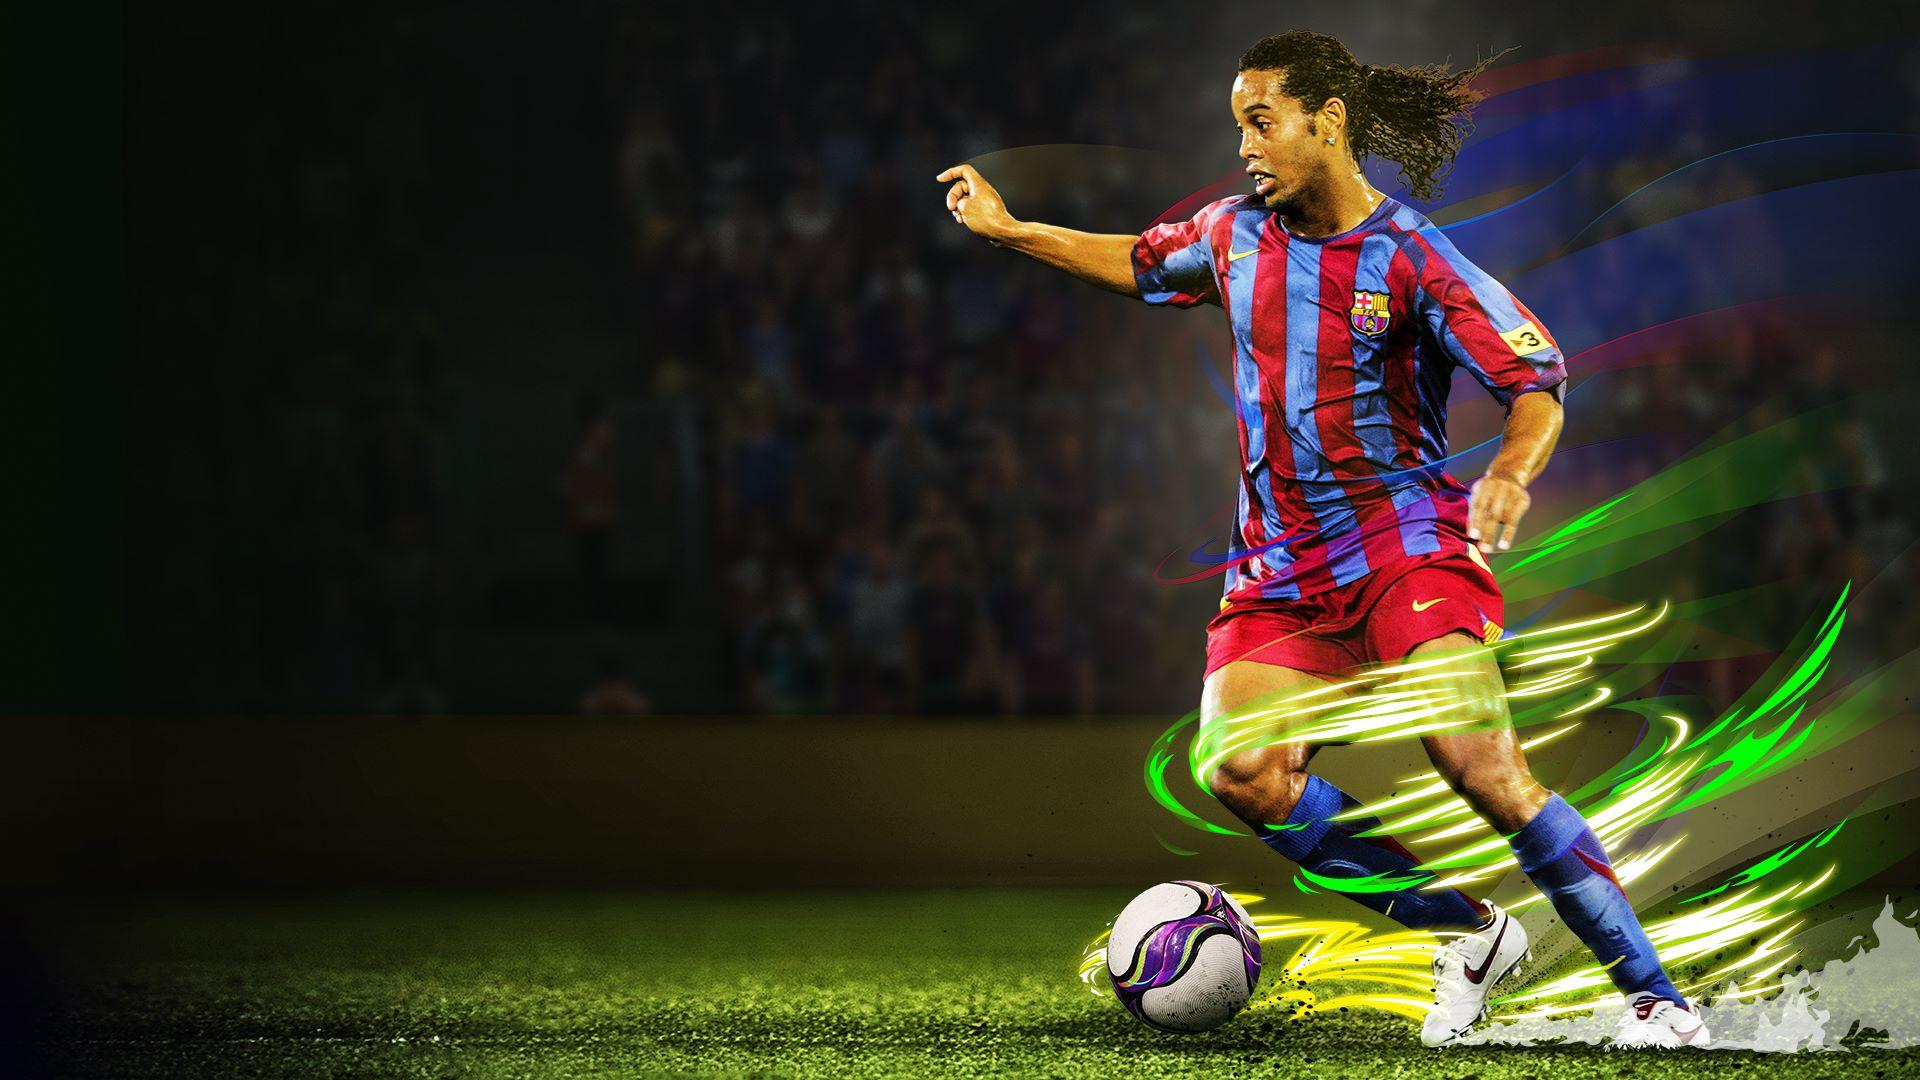 https://www.pdvg.it/wp-content/uploads/2019/08/efootball-pes-2020-uefa-euro-2020.jpg